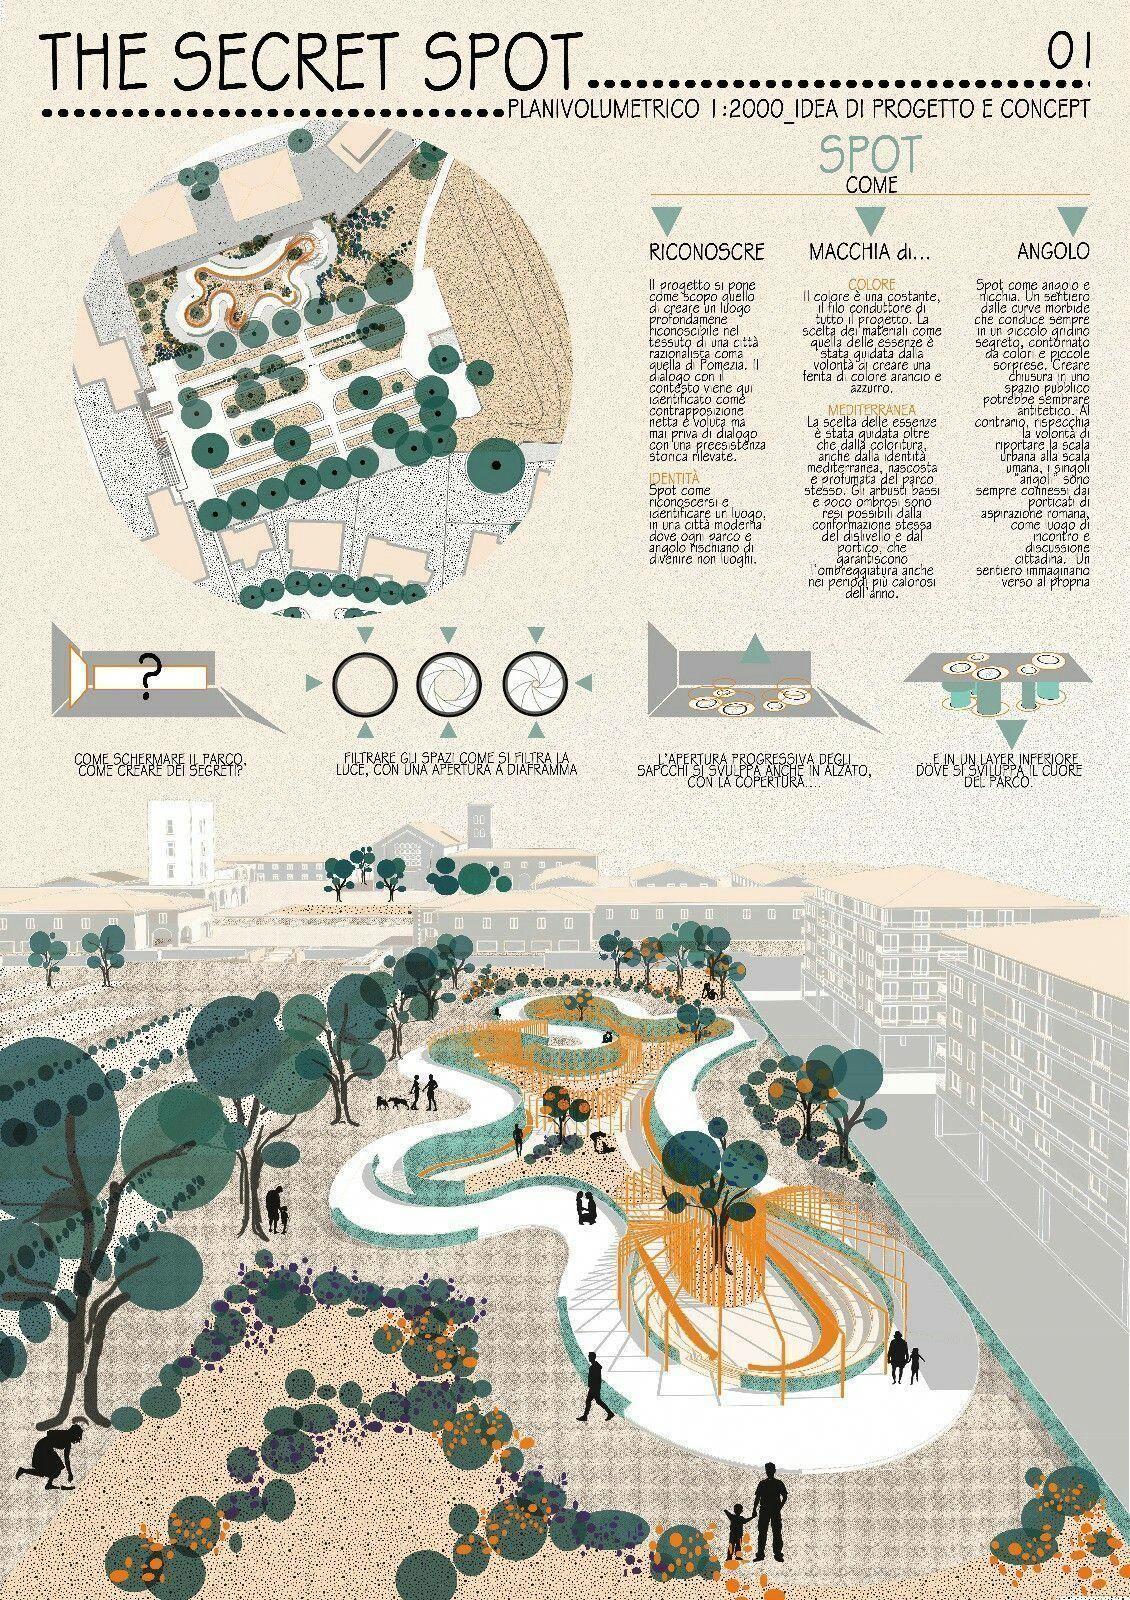 Landscape Architecture Garden Design Public Square Competition For A Public Landscape Architecture Park Landscape Architecture Presentation Parking Design